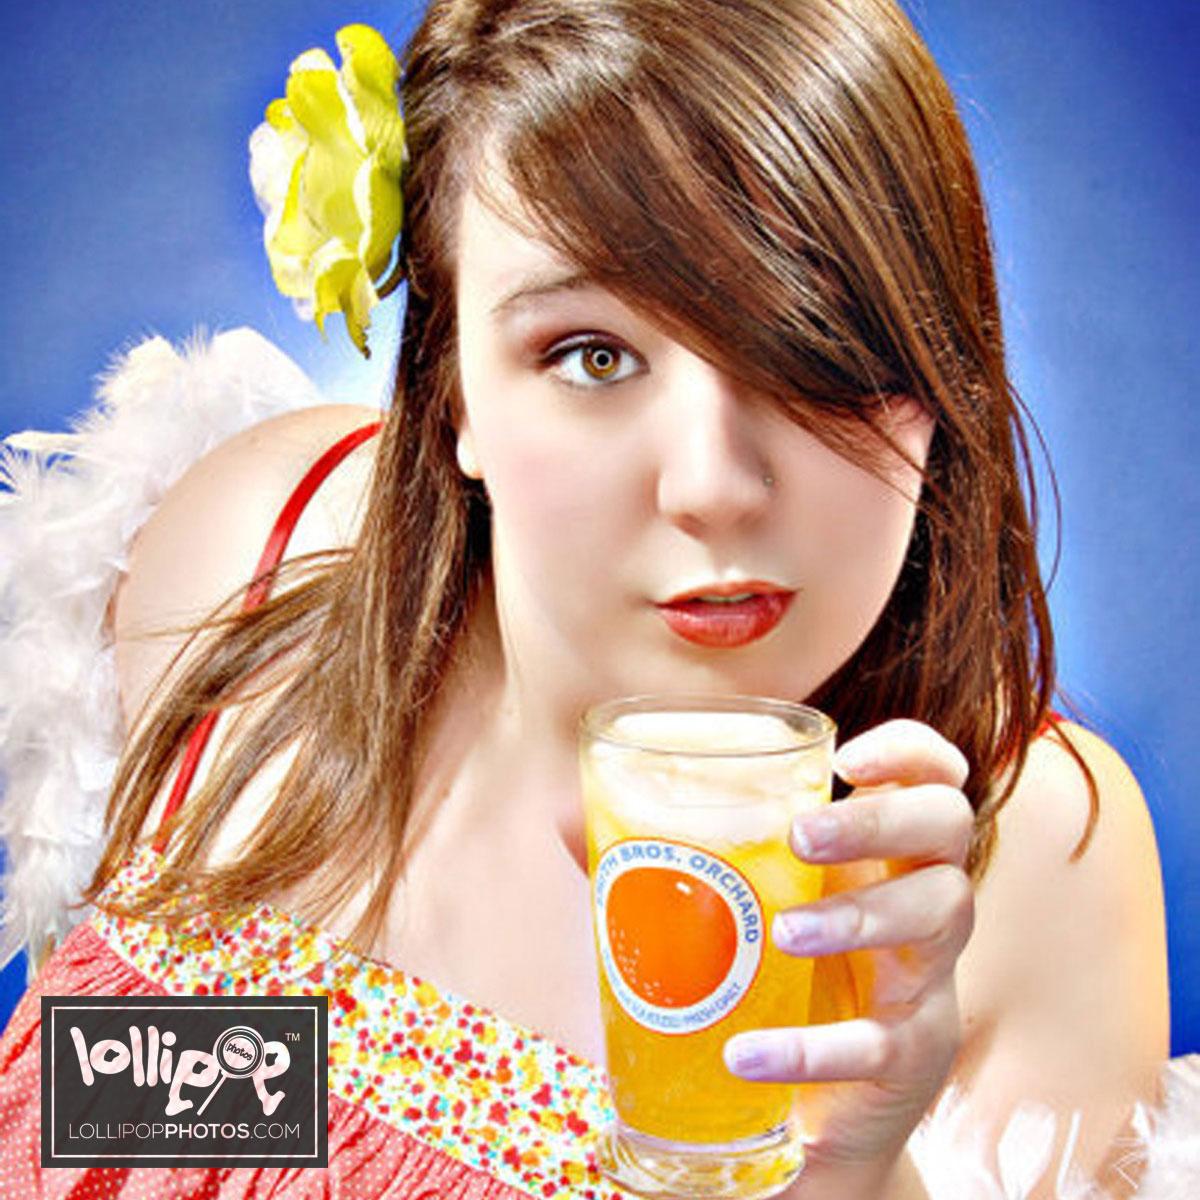 msdig-nora-canfield-lollipop-photos-017.jpg